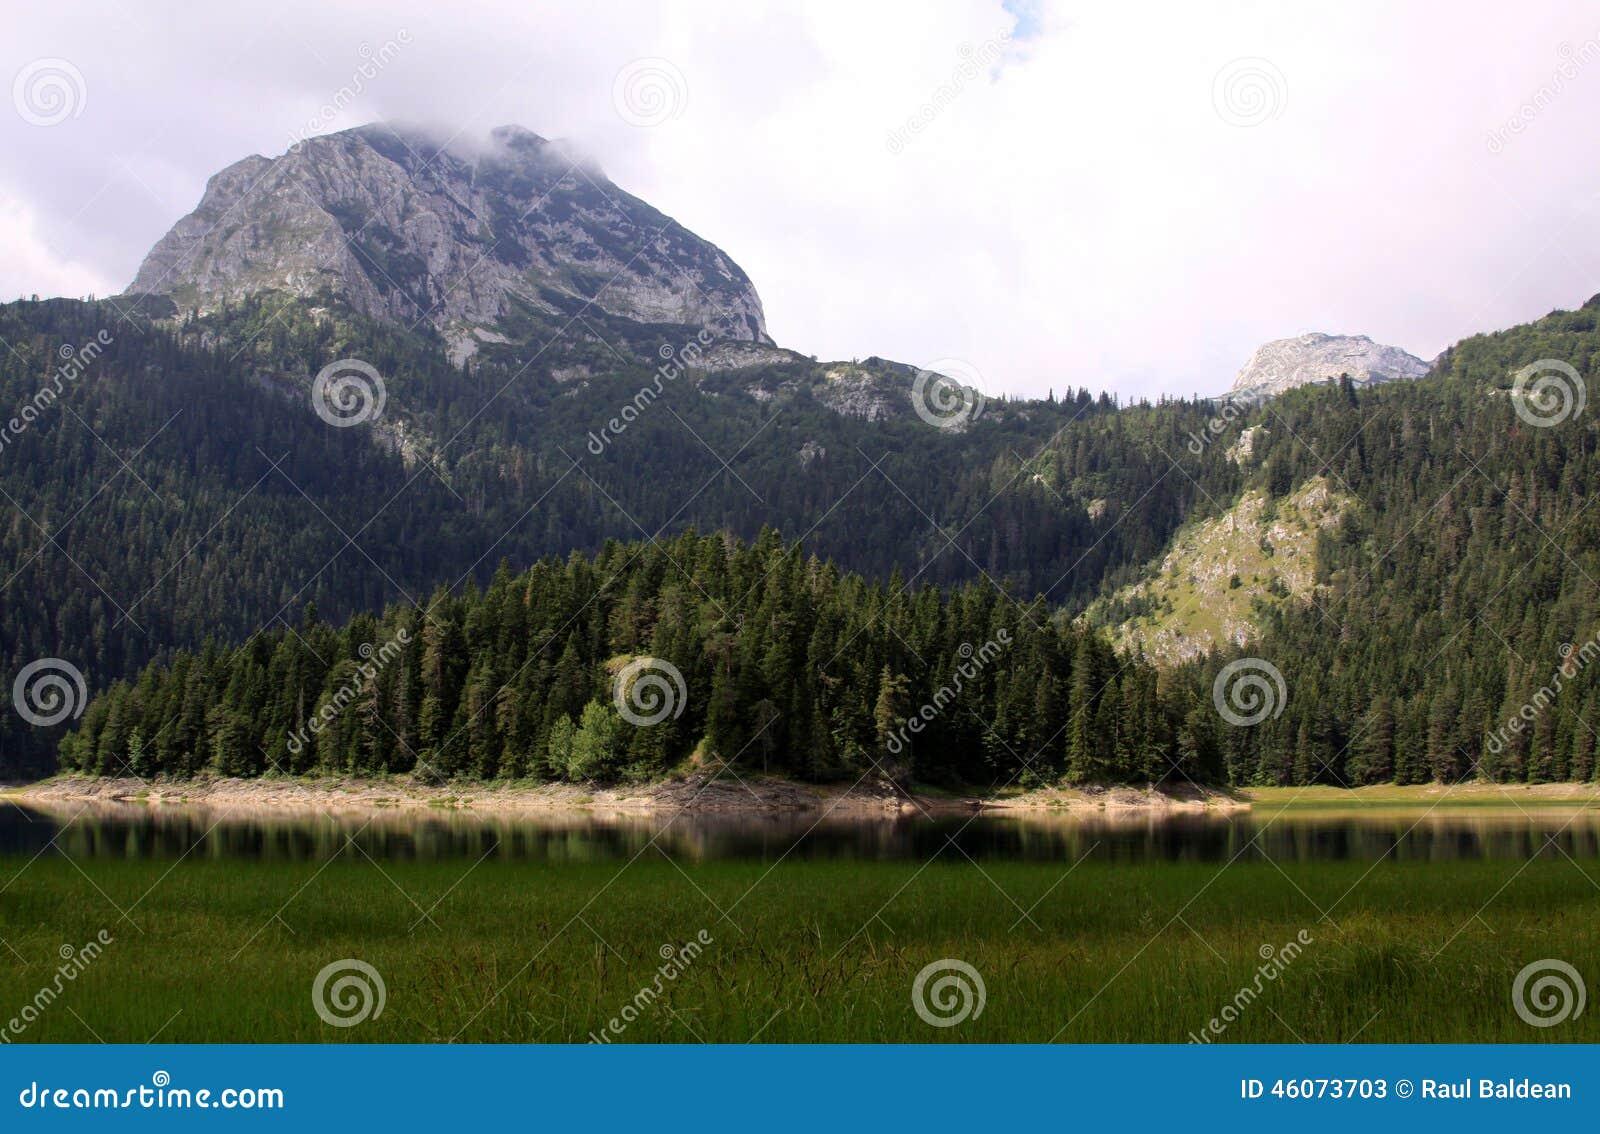 Crno Jezero (μαύρη λίμνη), εθνικό πάρκο Durmitor, Μαυροβούνιο 04